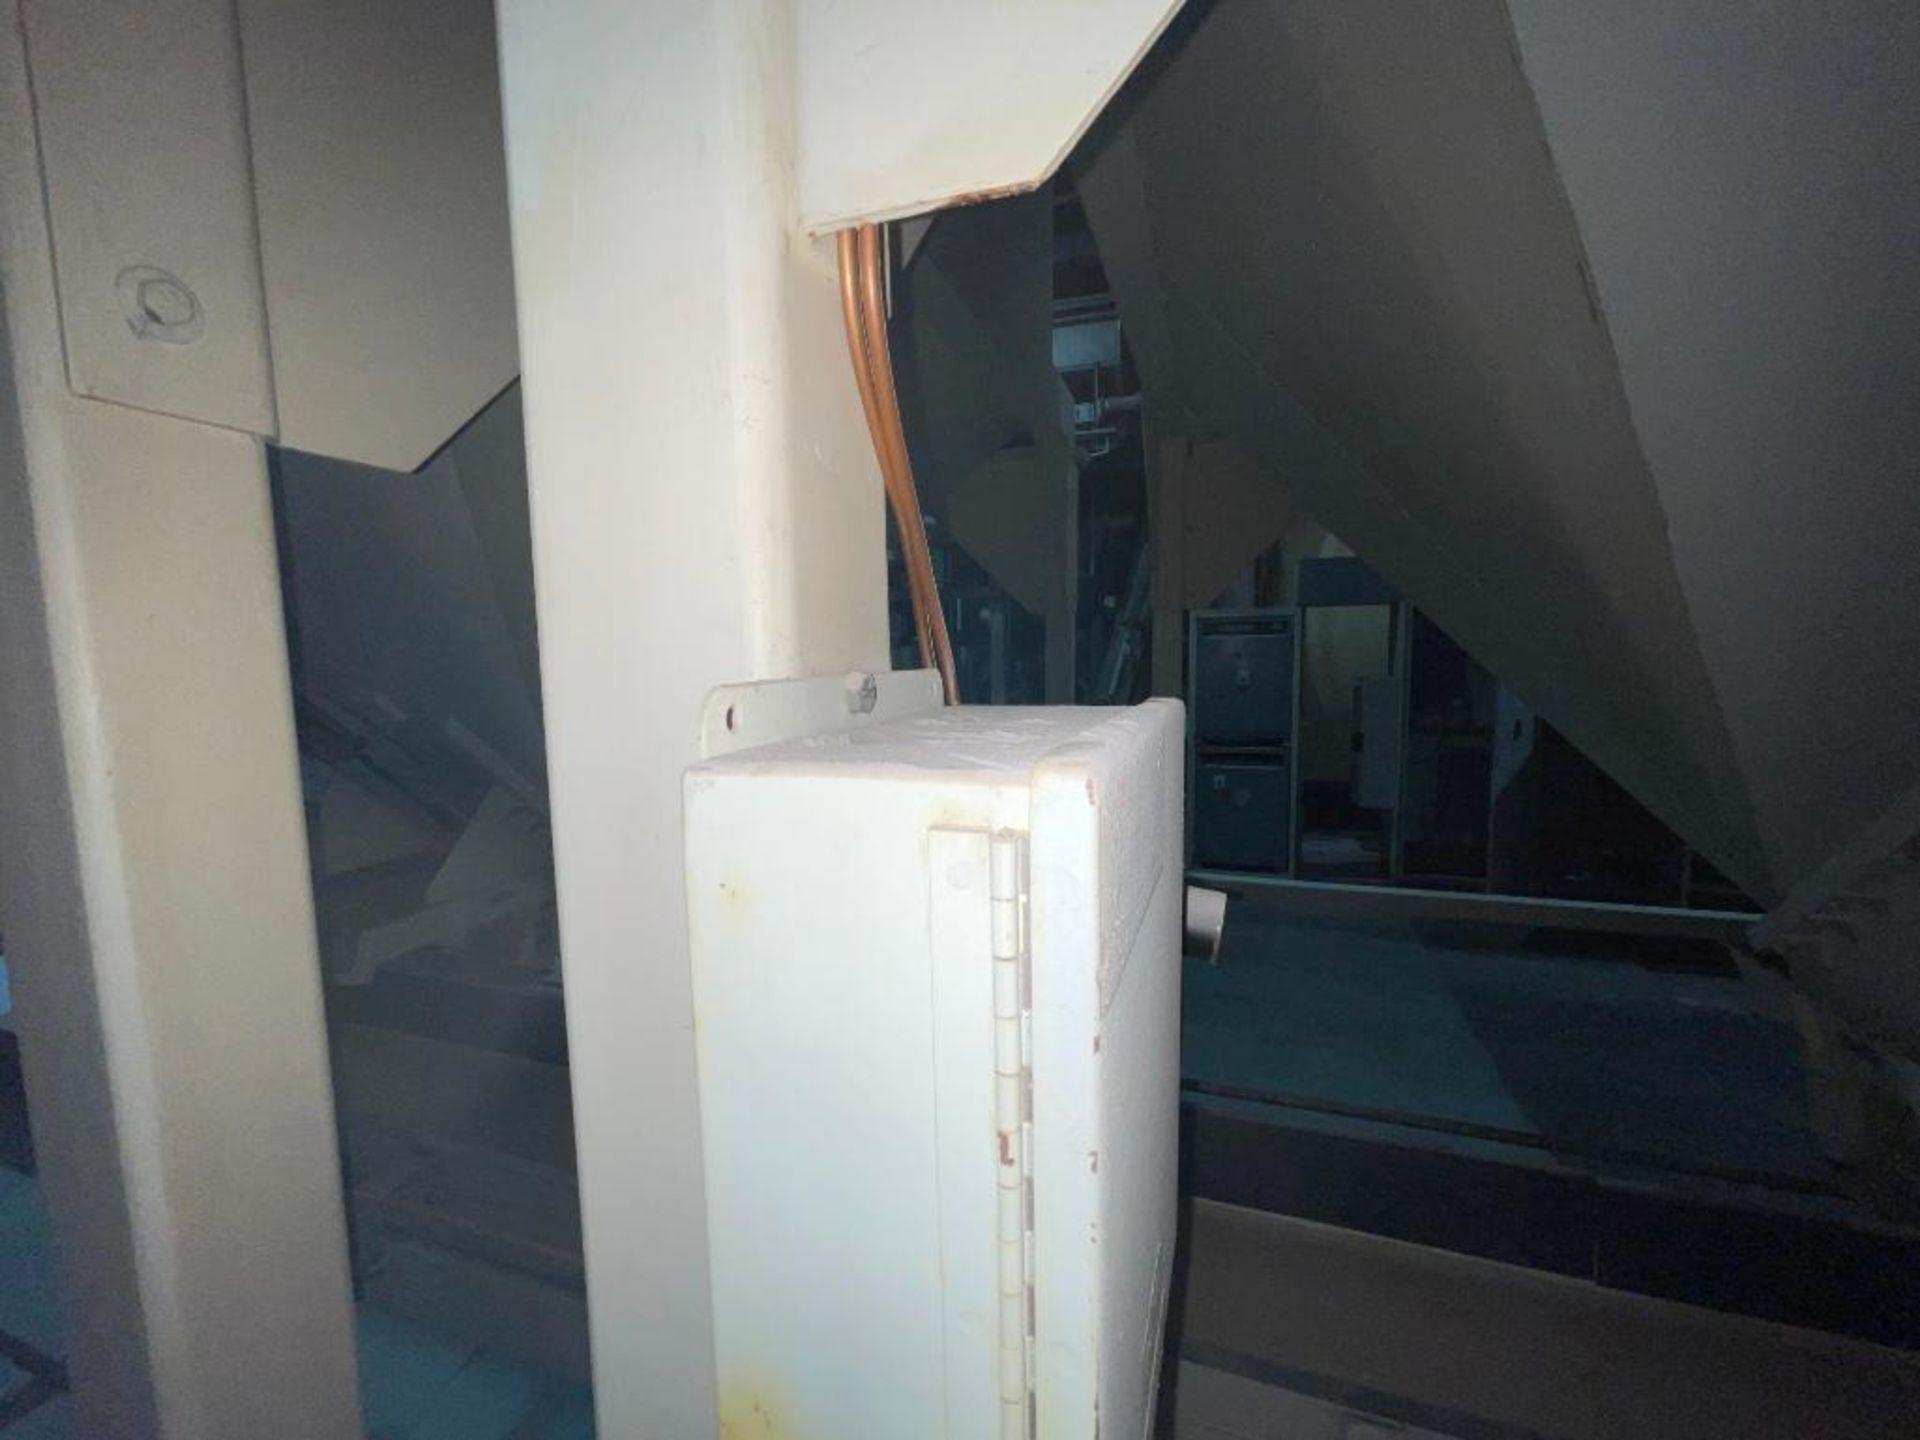 Aseeco mild steel cone bottom bulk storage bin - Image 26 of 31